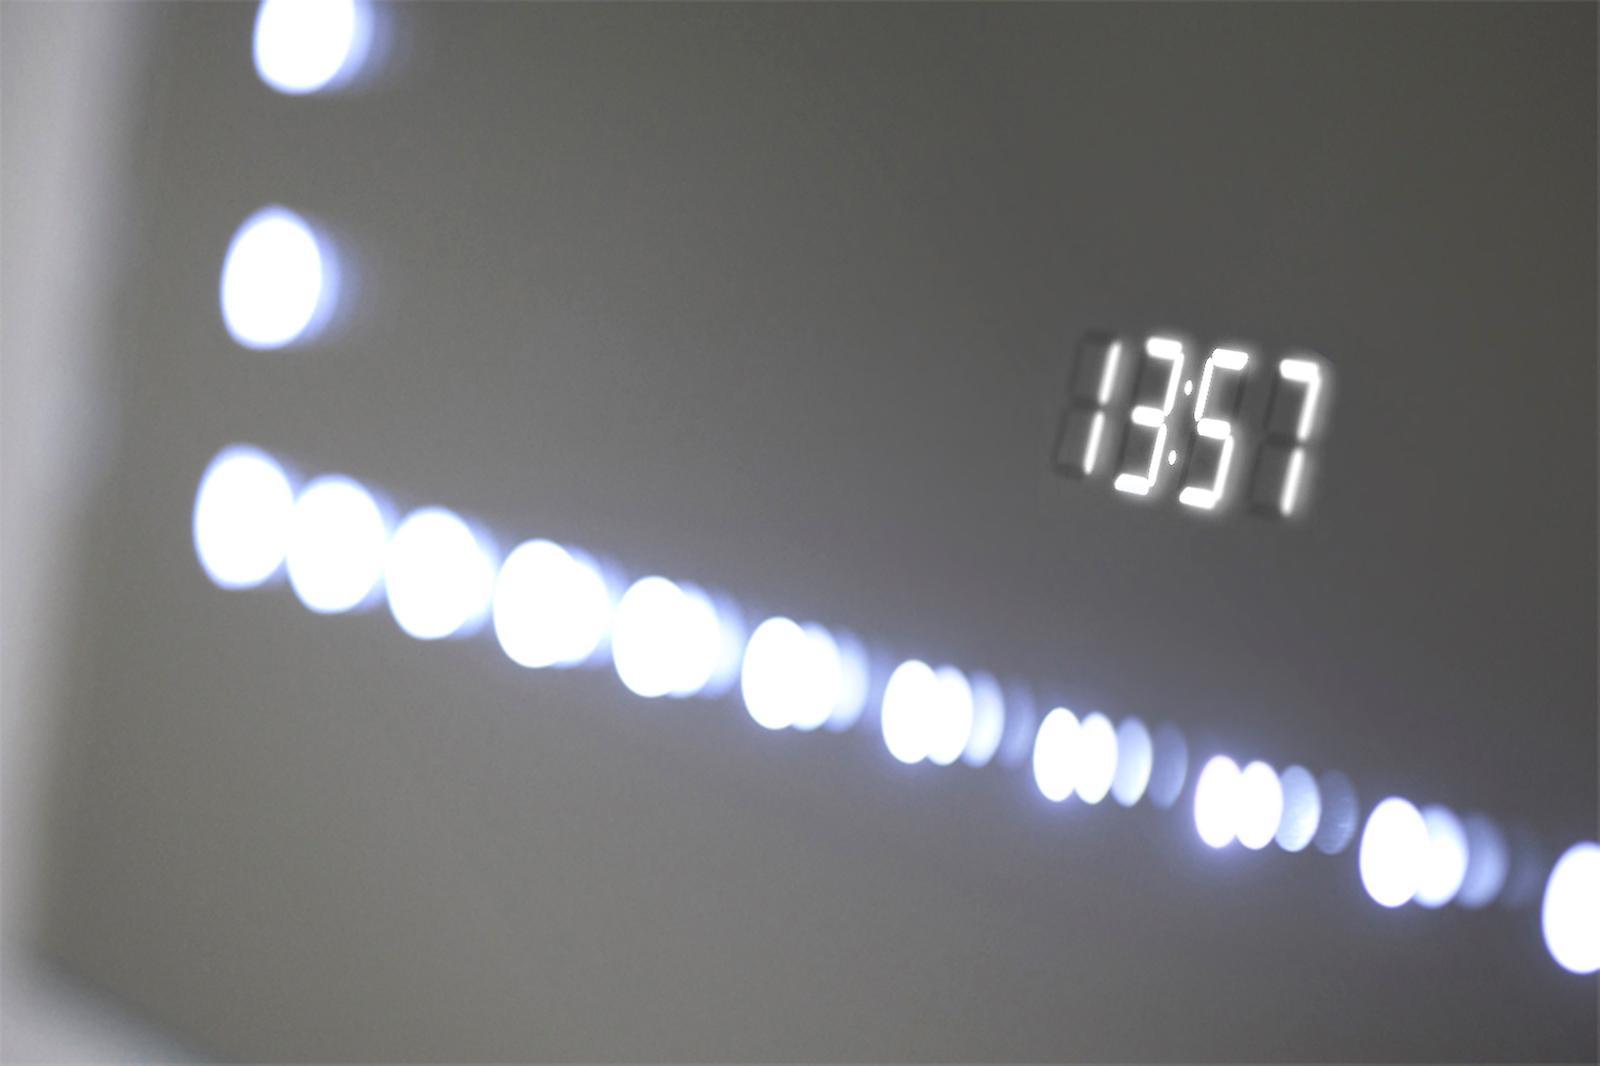 Bluetooth With Digital Clock, Demister, & Sensor K392aud